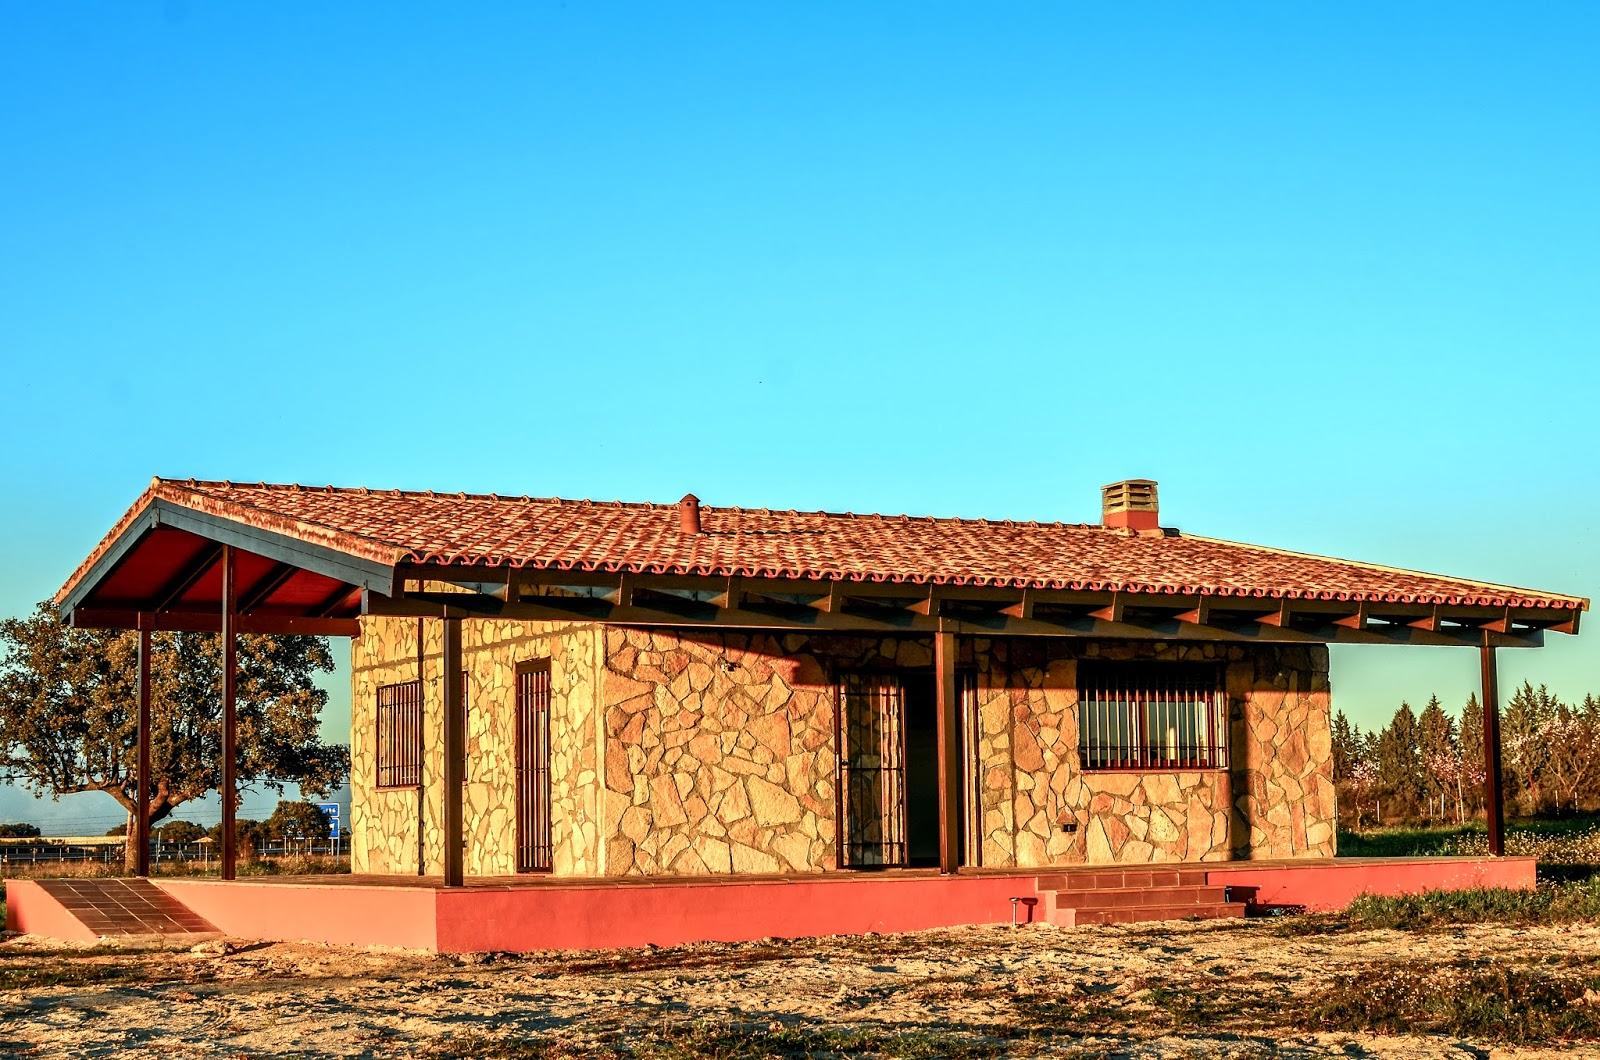 Casas prefabricadas madera casas prefabricadas burgos - Casas prefabricadas burgos ...